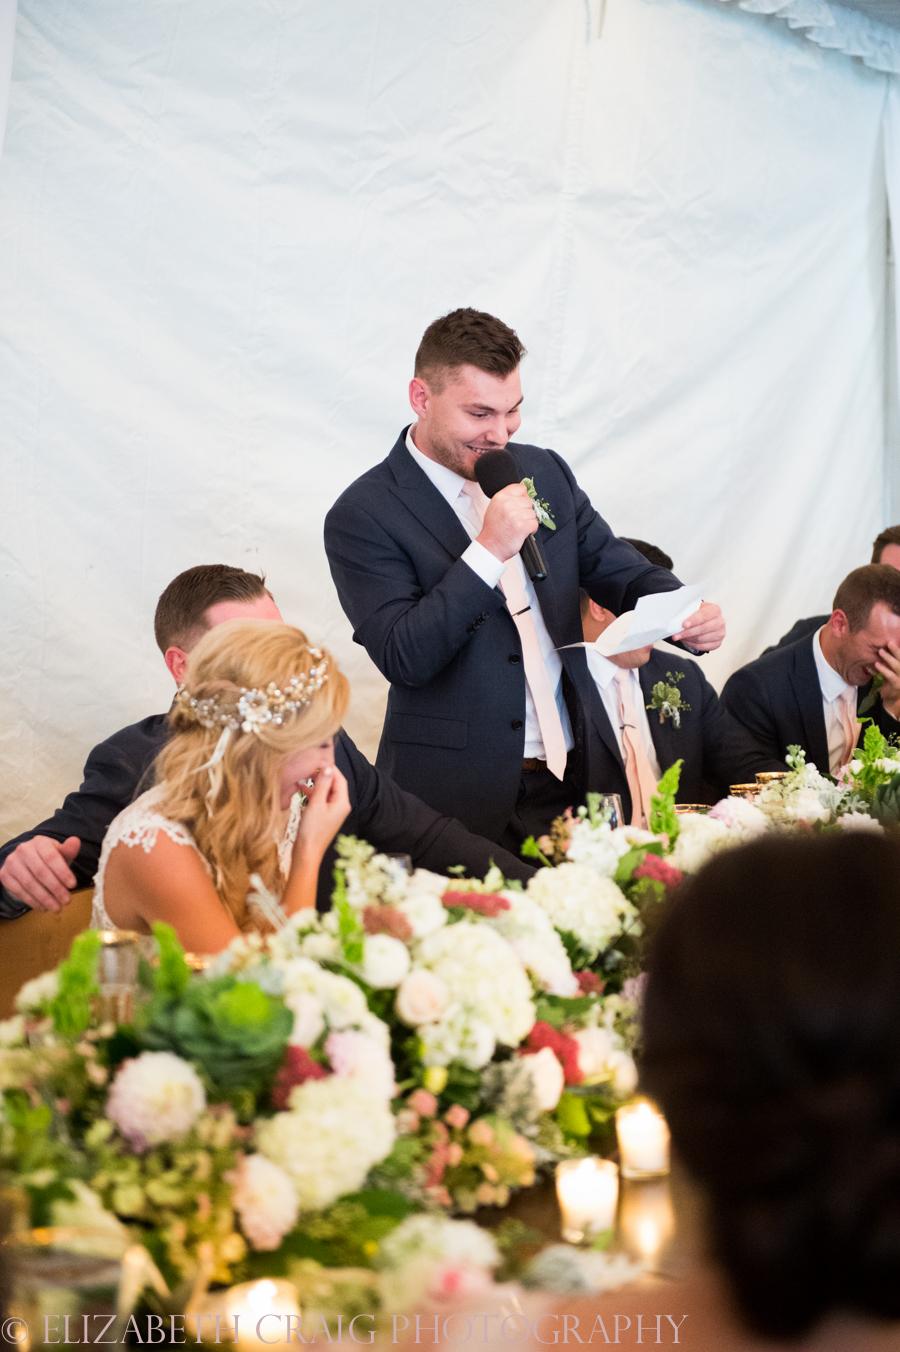 Dubois Brockway St. Marys PA Weddings-0217